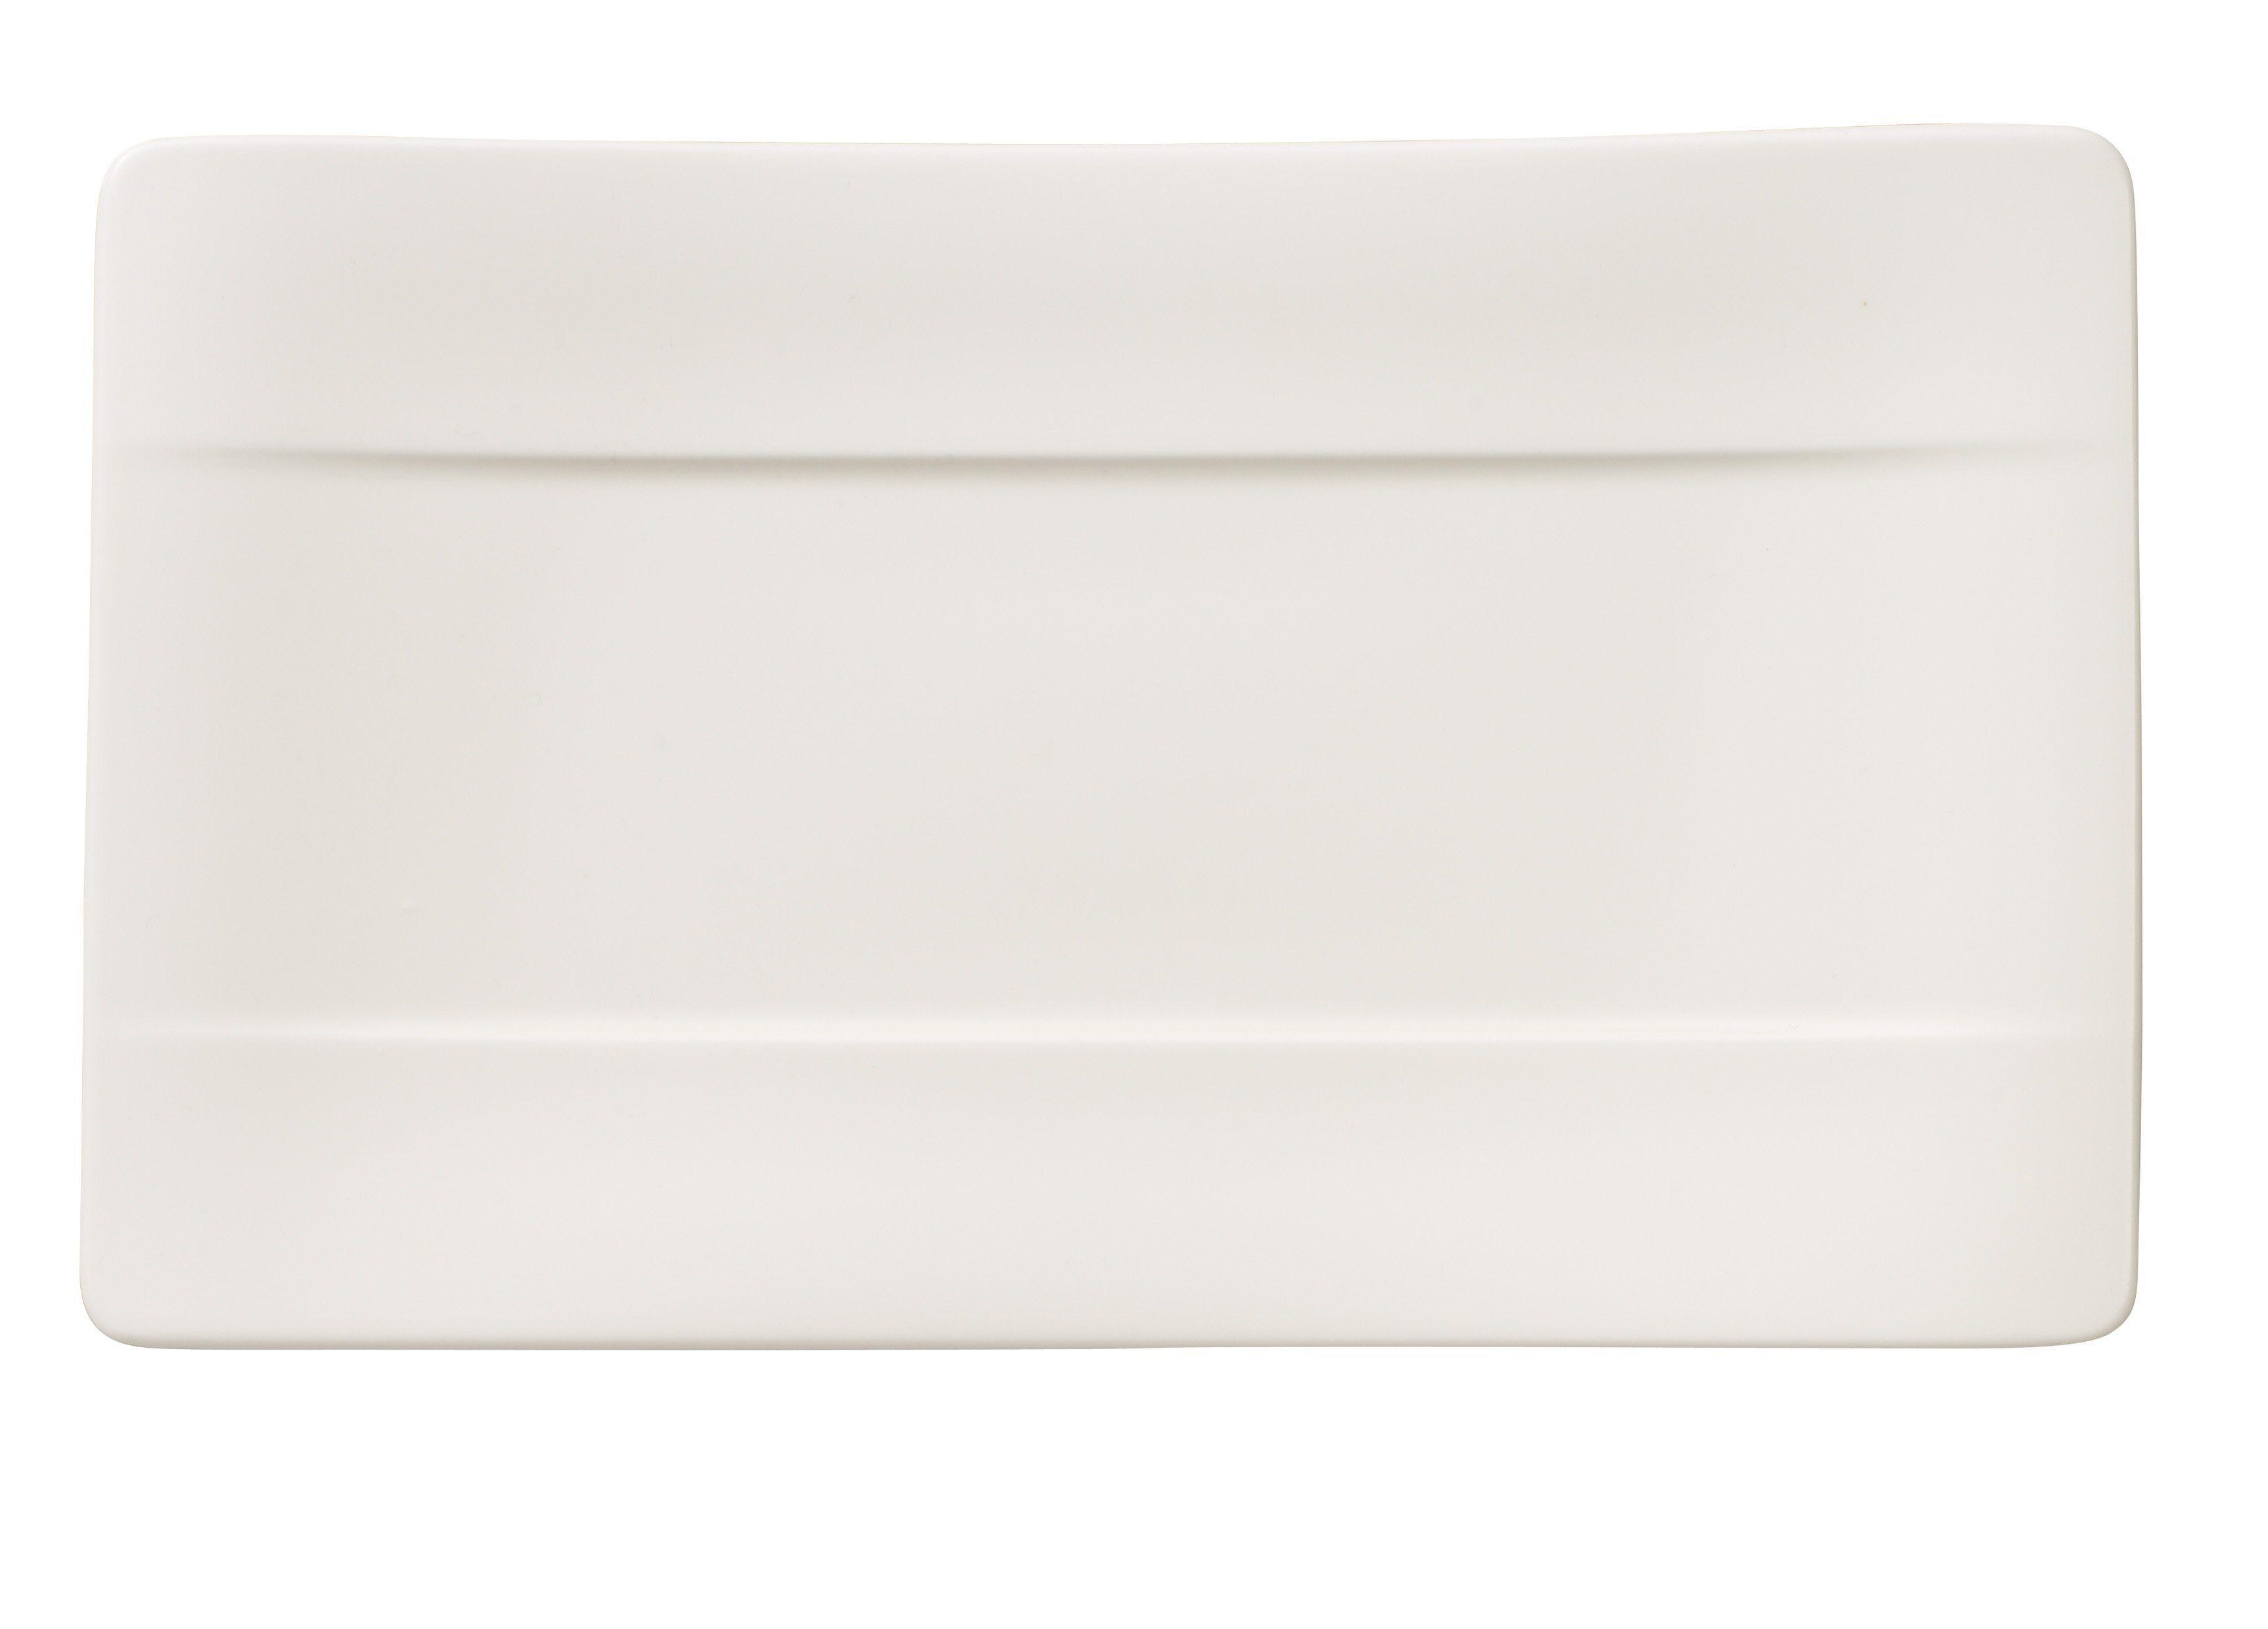 Villeroy & Boch Sushi-Teller 24x14cm »Modern Grace«